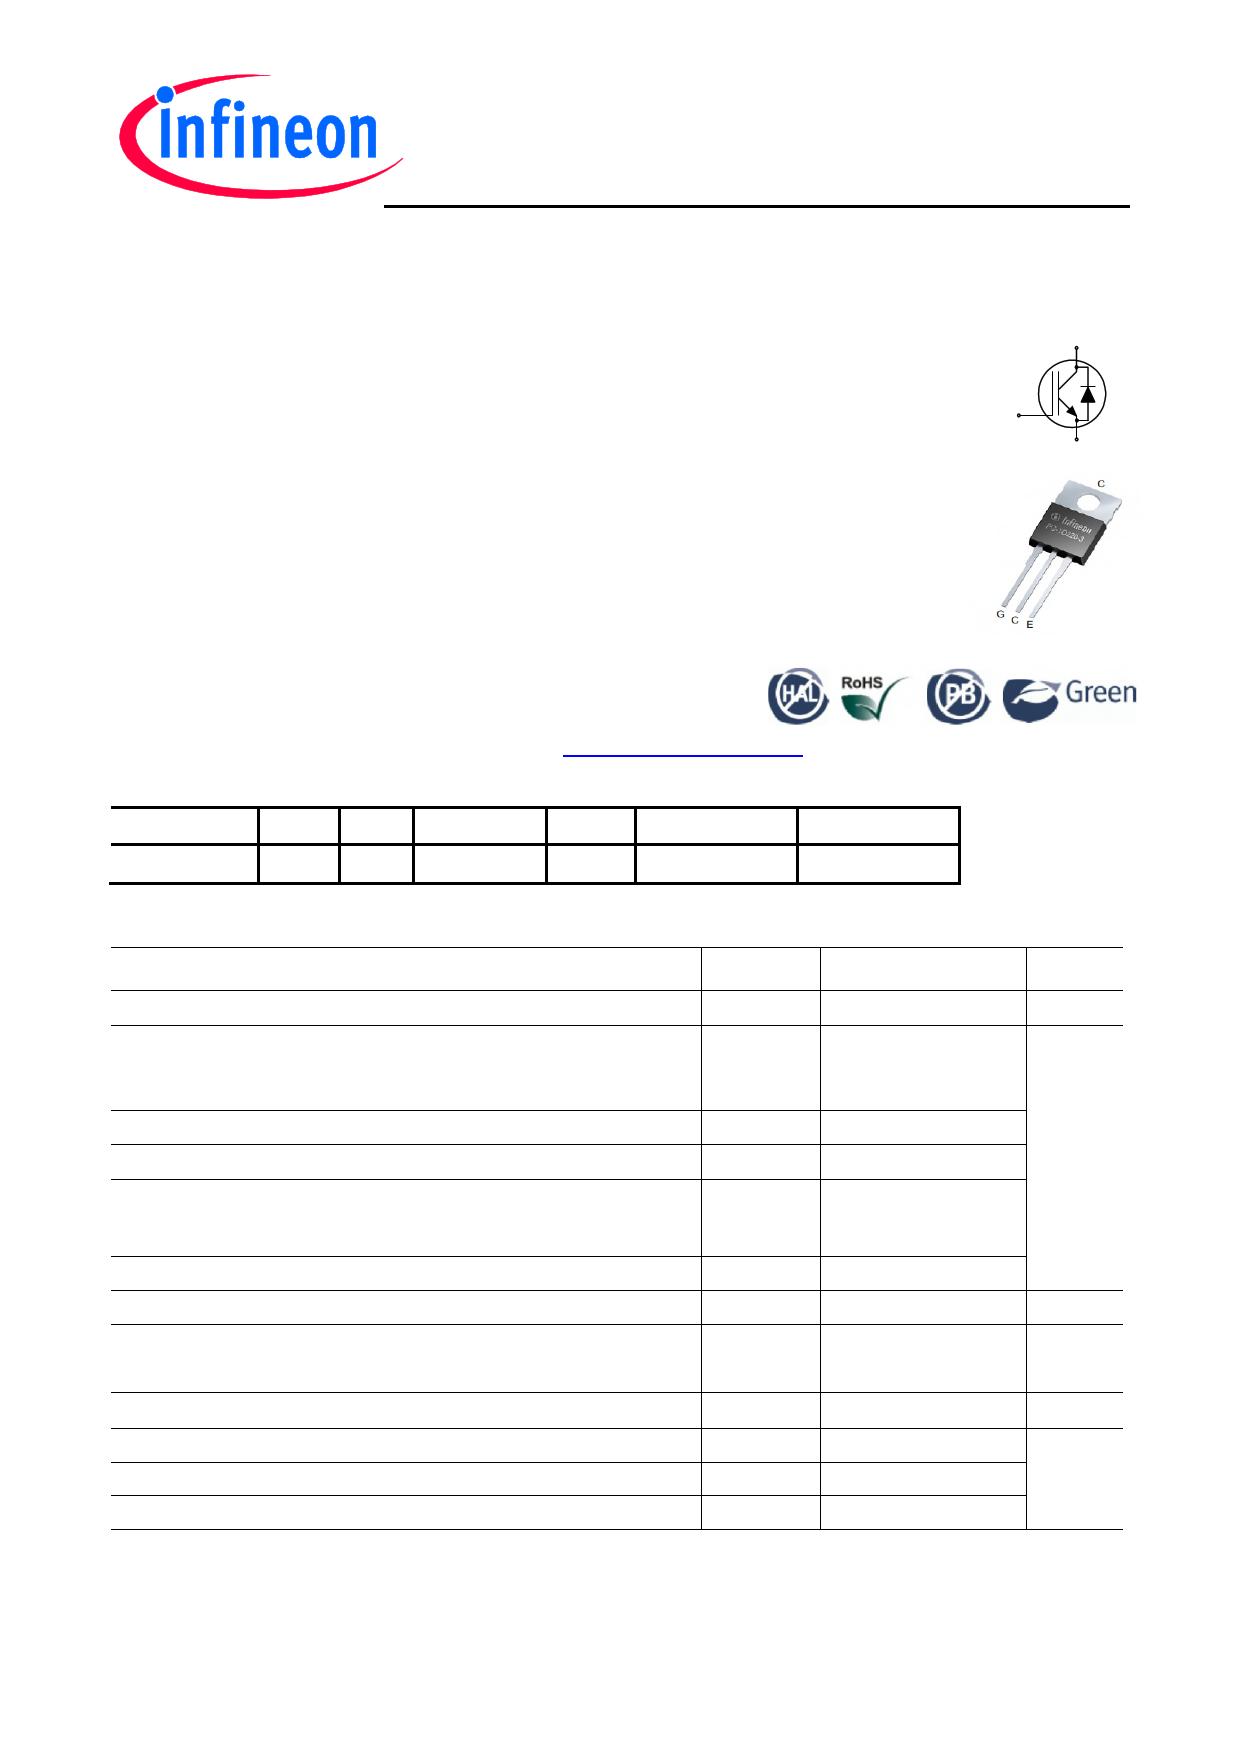 IKP04N60T Datasheet, IKP04N60T PDF,ピン配置, 機能